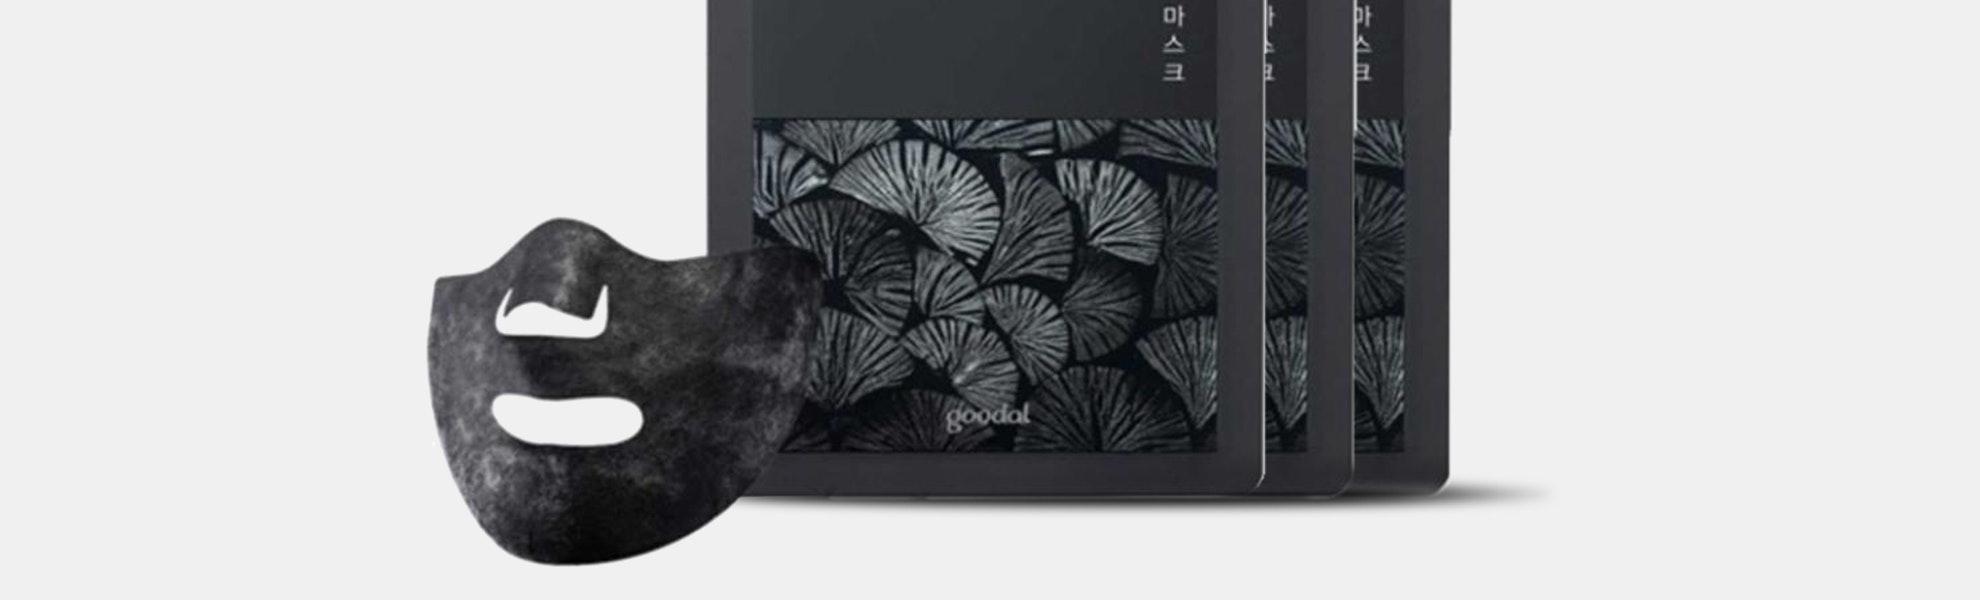 Goodal Black Charcoal Carbonated Masks (3 Sheets)